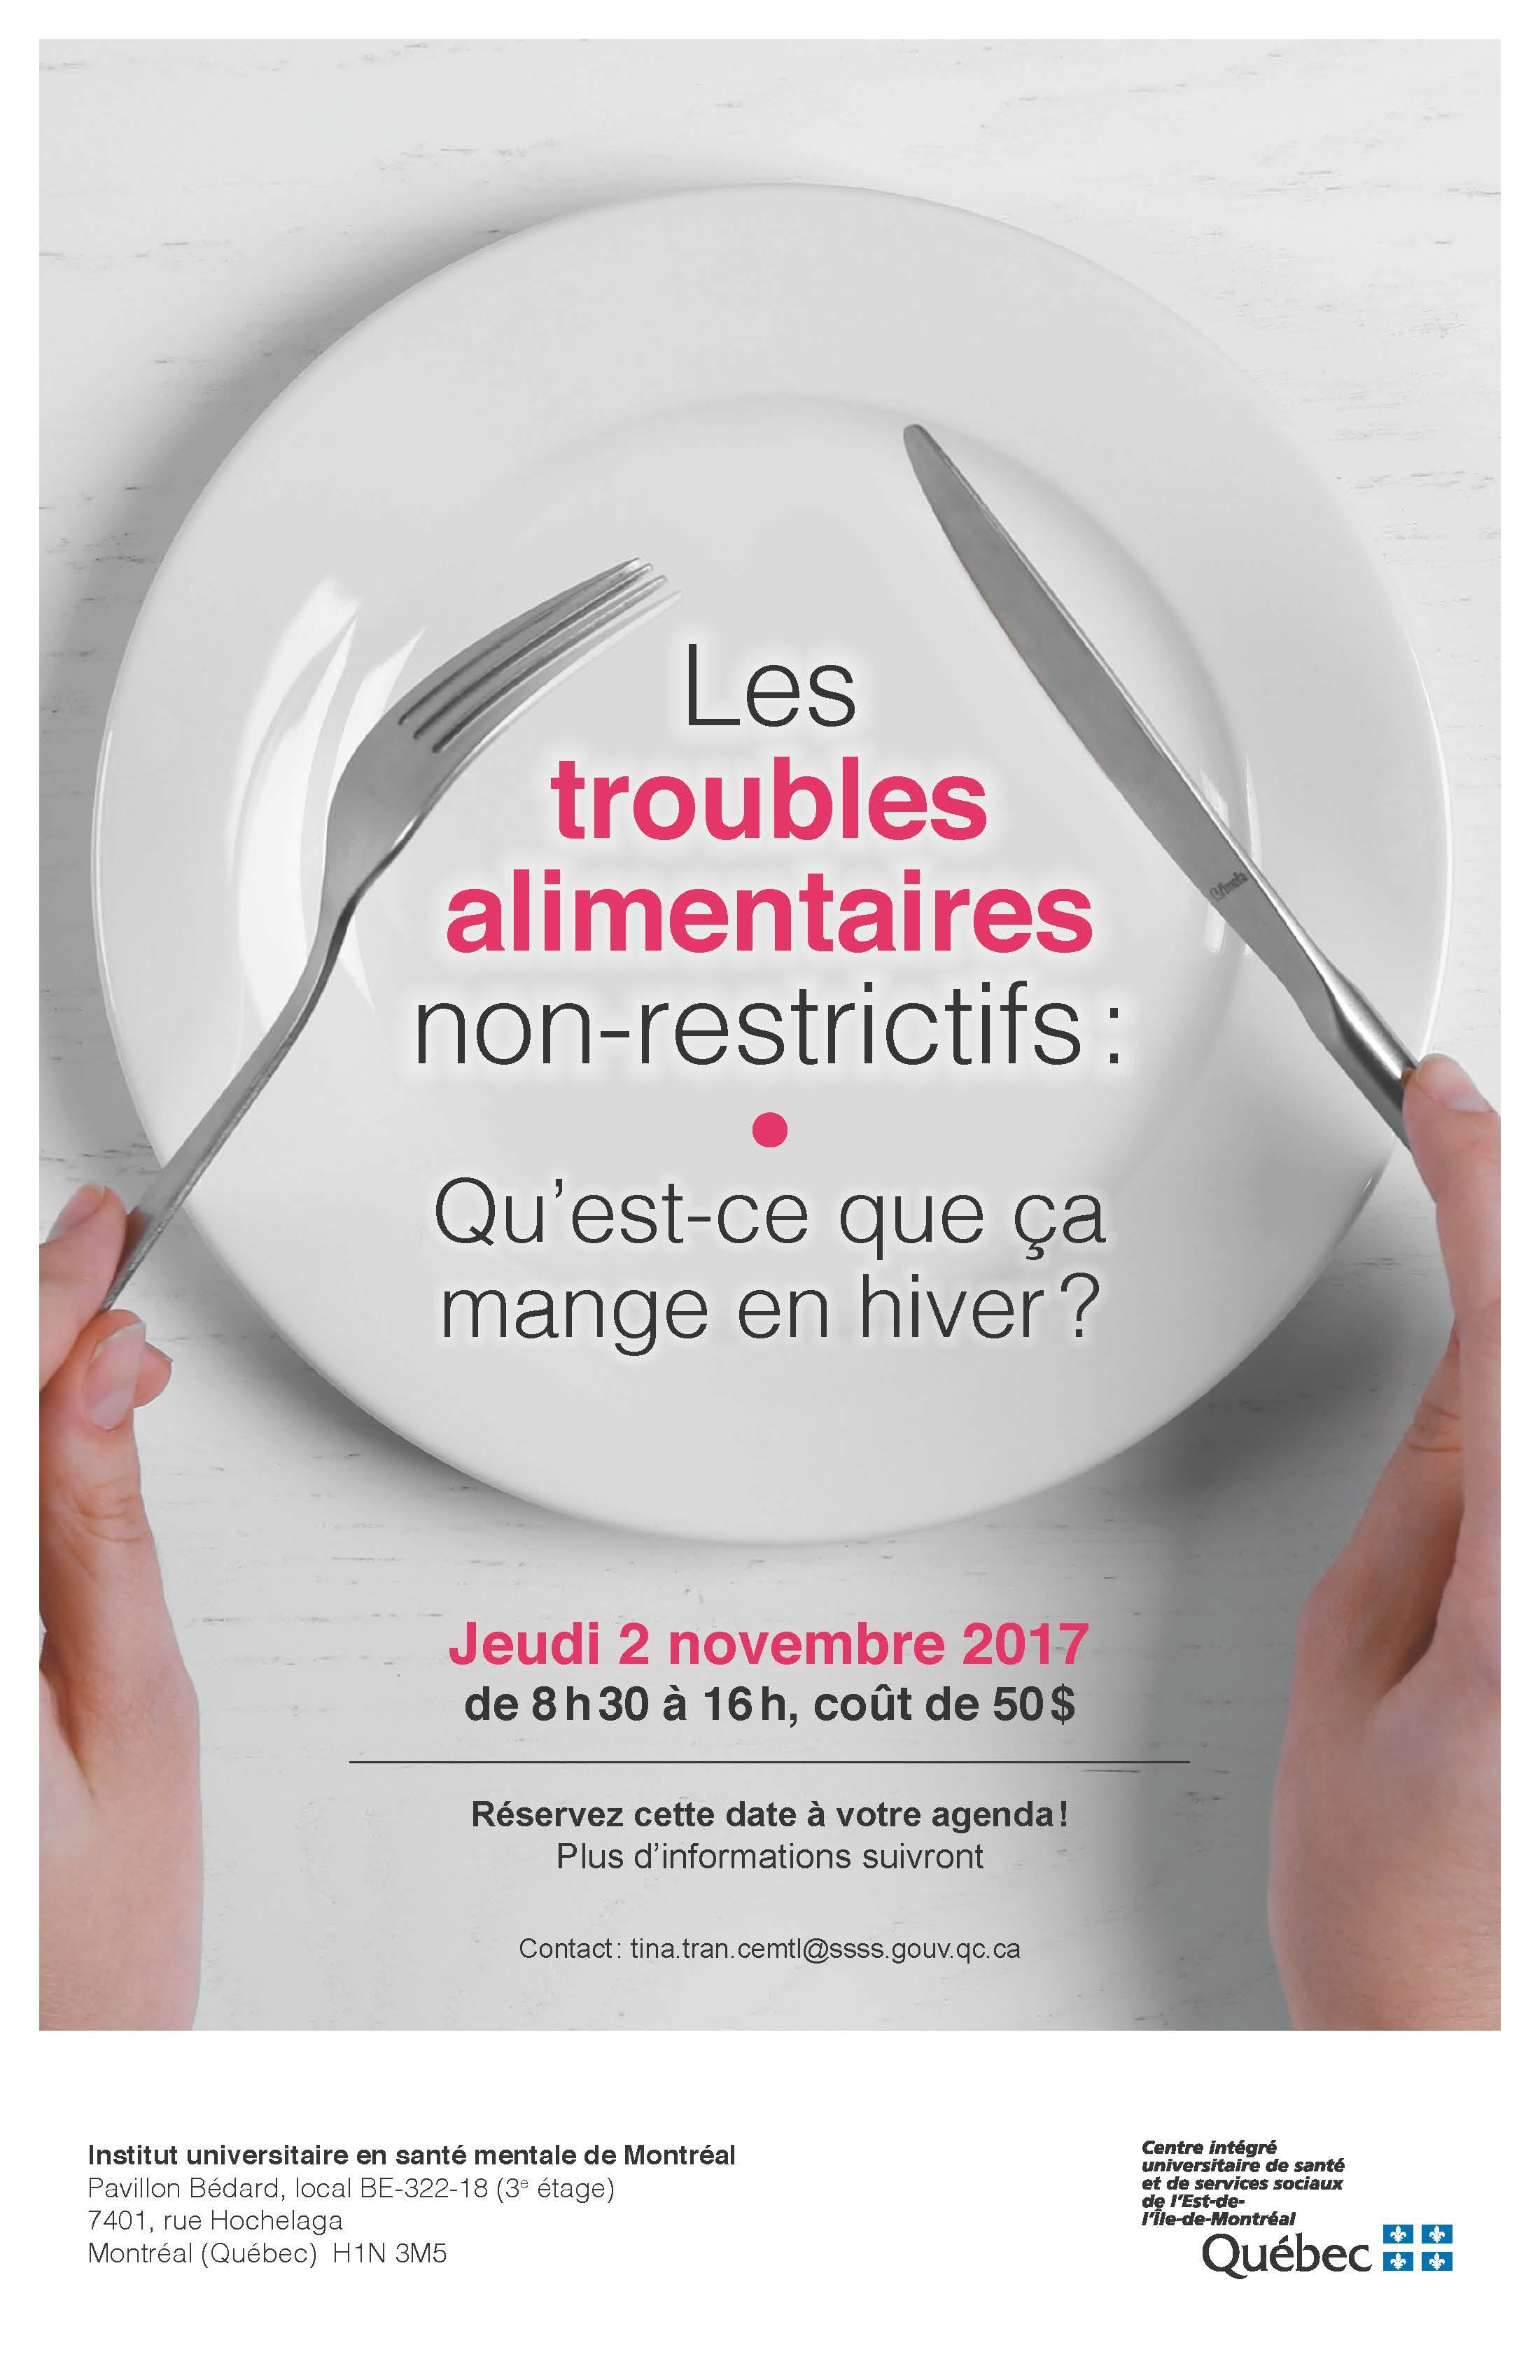 Les troubles alimentaires non-restrictifs - Colloque au IUSMM/UdeM - 2 novembre 2017 - Vincenzo Di Nicola/IUSMM/UdeM